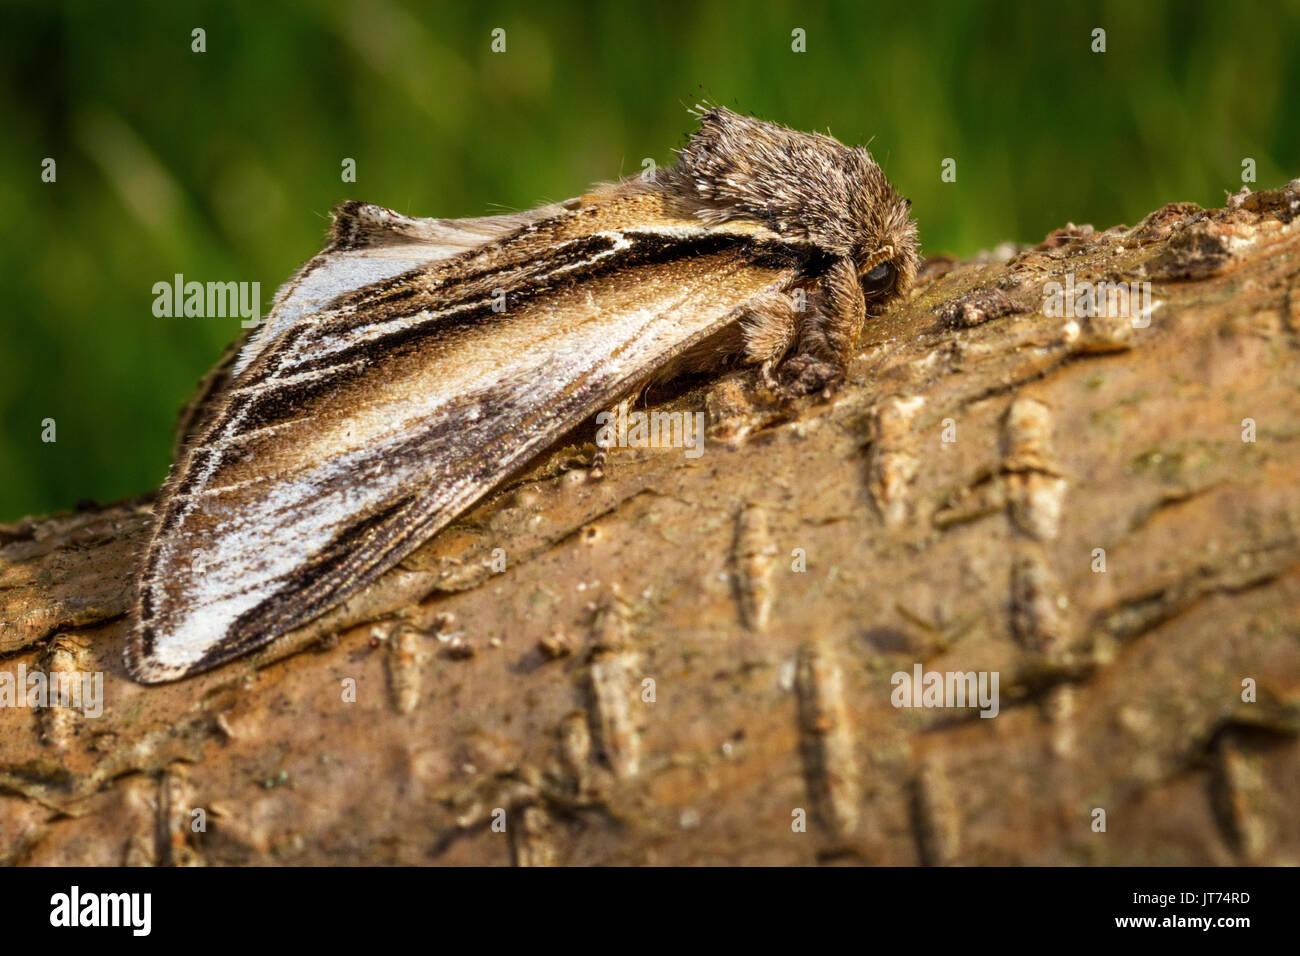 Royaume-uni: la faune importante (pheosia tremula avaler), imago on tree branch, Doncaster, Royaume-Uni Photo Stock